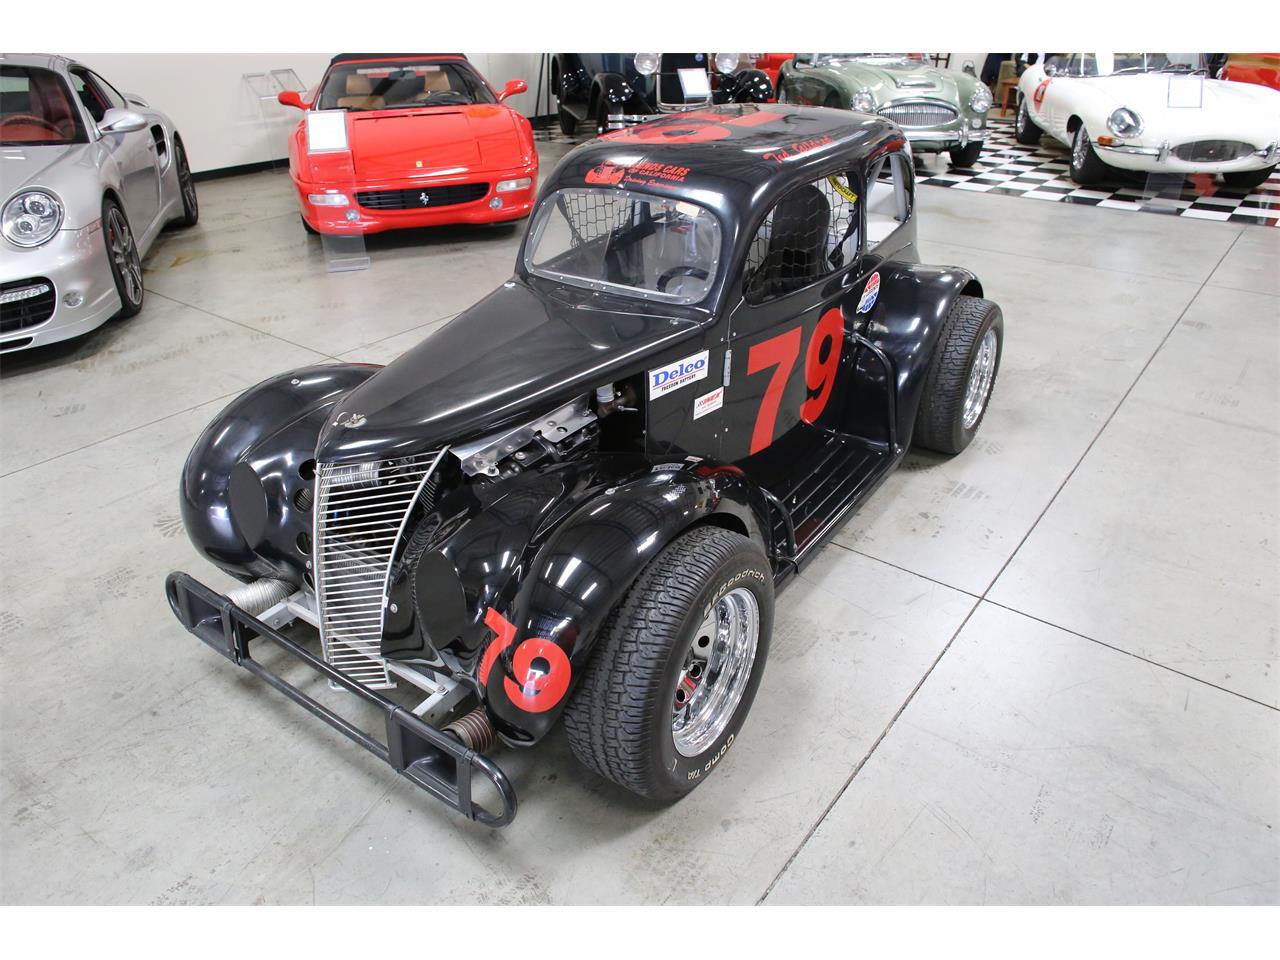 600 legend race car wiring wiring library600 Legend Race Car Wiring #8